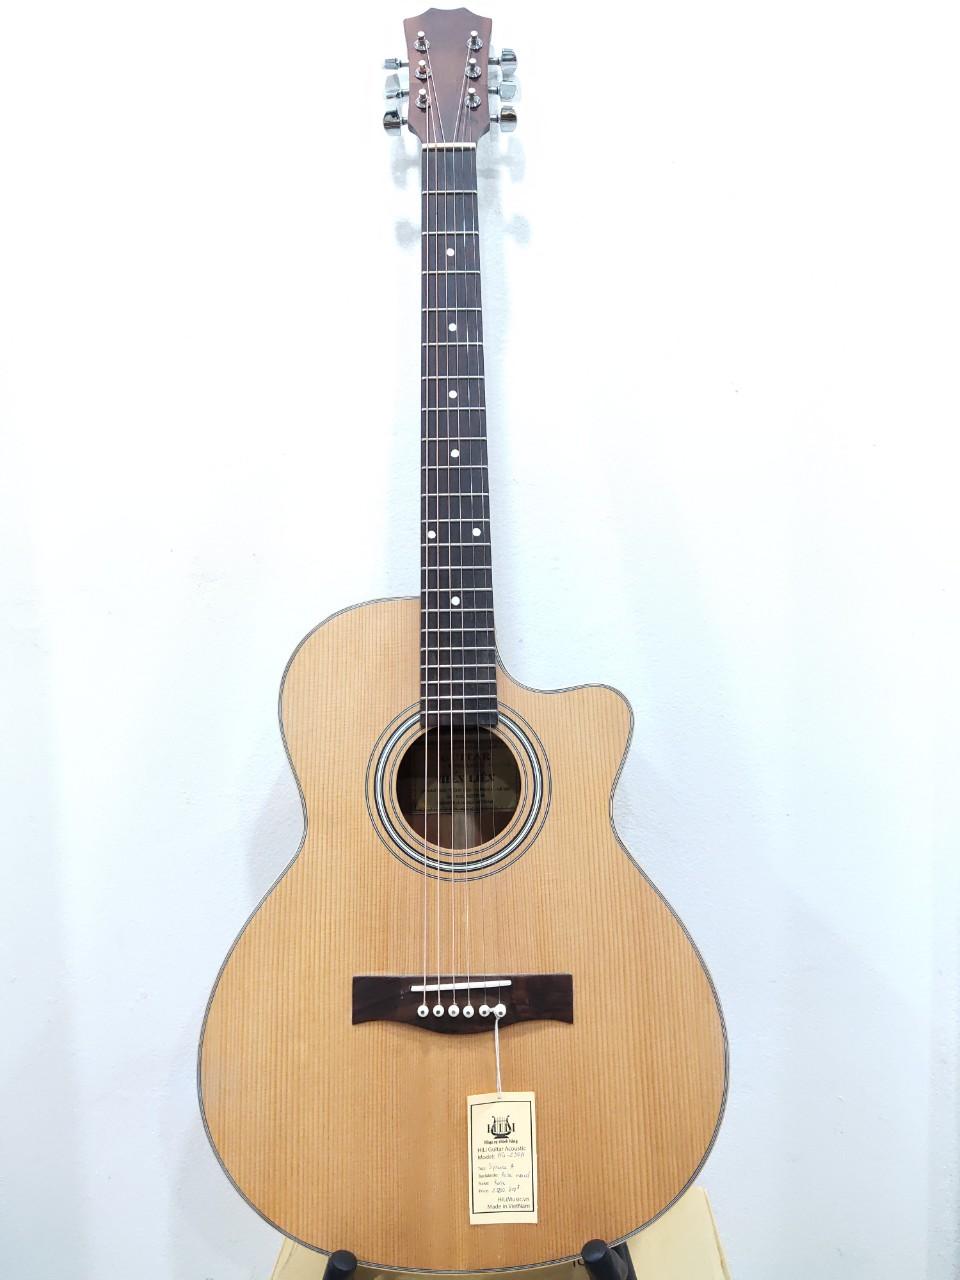 Đàn Guitar Acoustic AG-230A made in VietNam